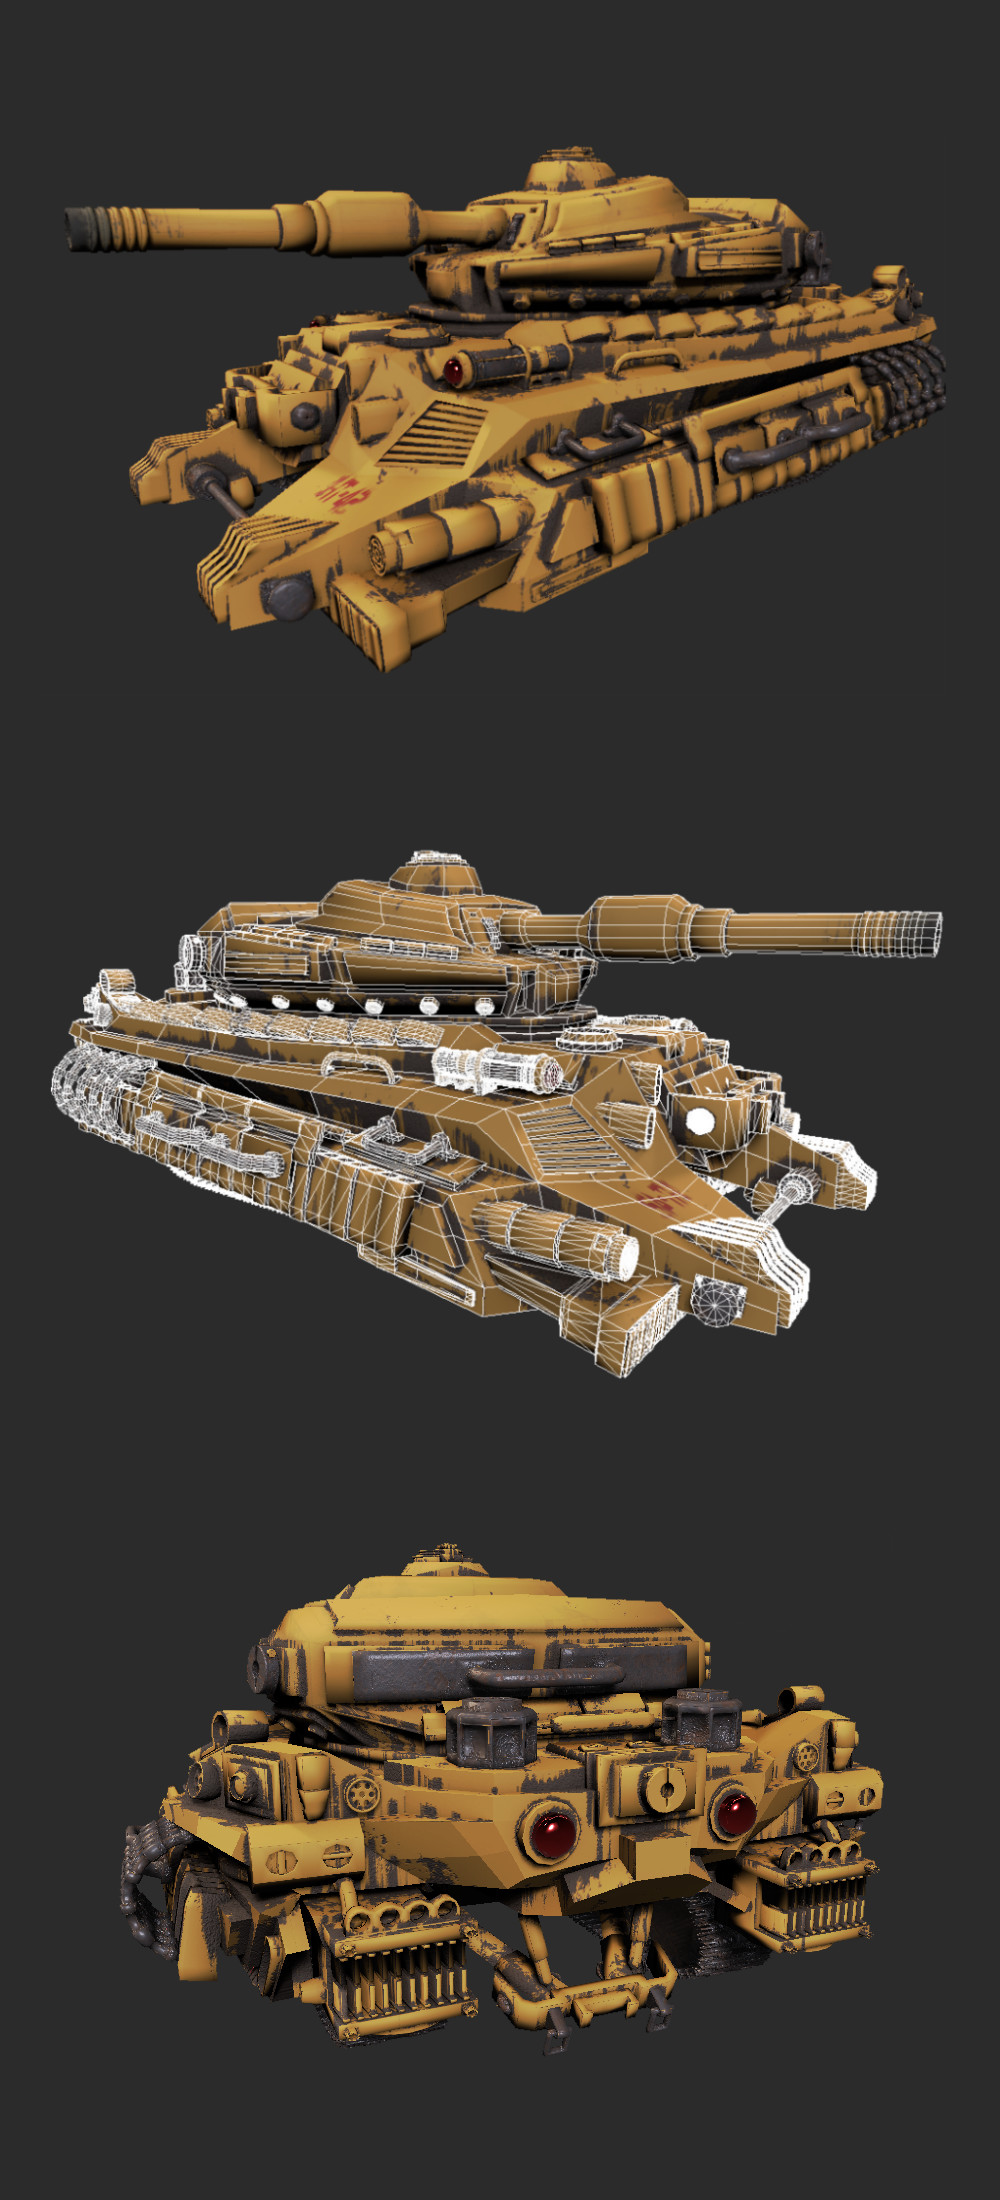 Omar pico 05 tank textures omarpico